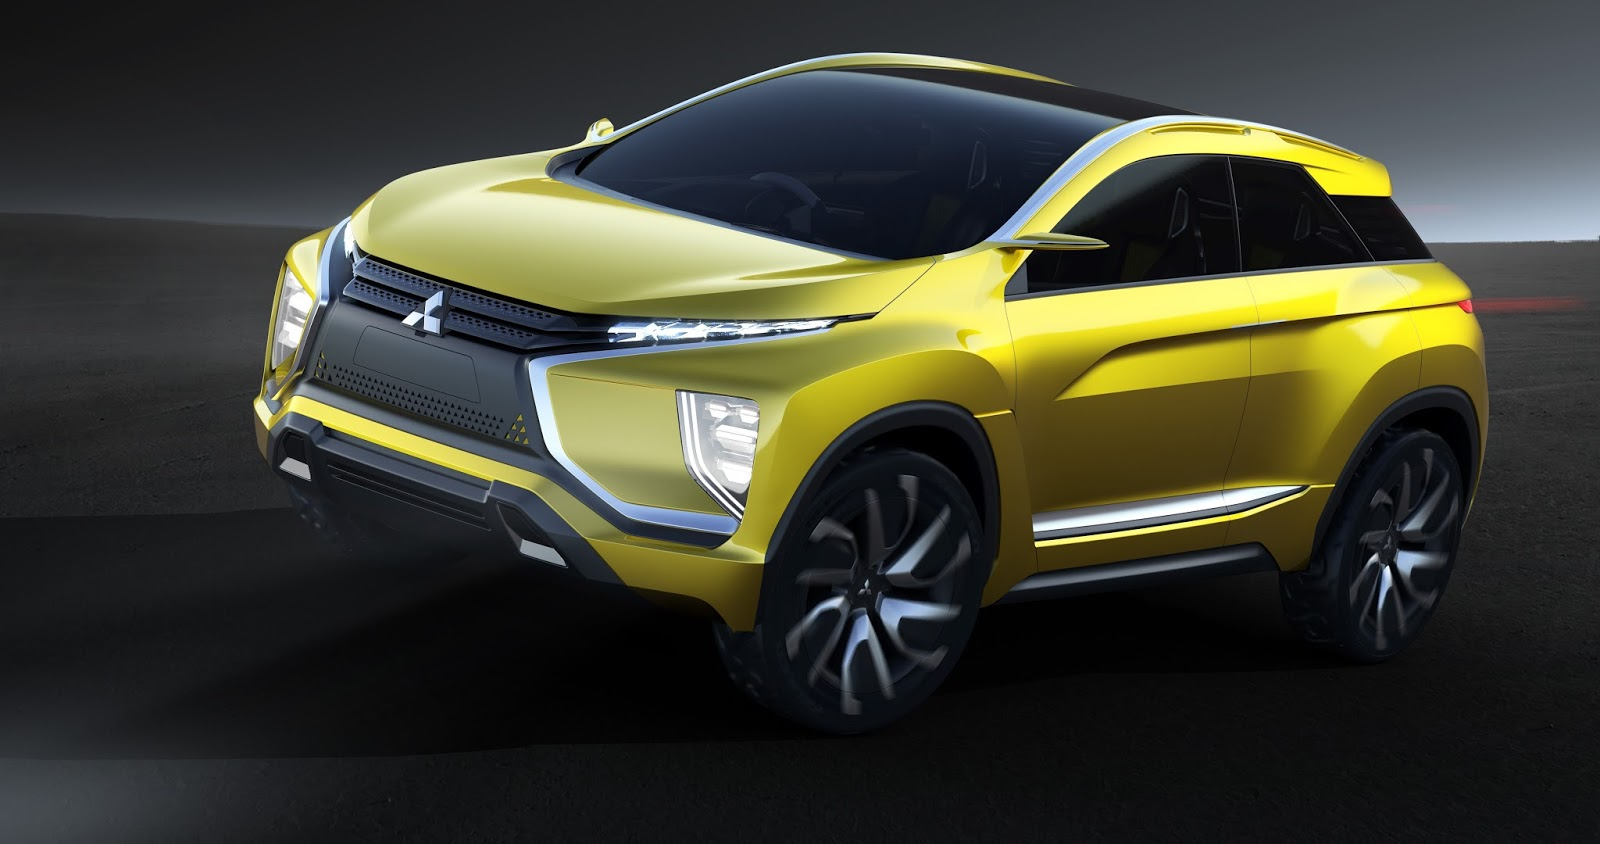 Mitsubishi%2BeX Concept H Mitsubishi εστιάζει στα SUV και τα παρουσιάζει στην Έκθεση Αυτοκινήτου της Γενεύης Mitsubishi, Mitsubishi ASX, MITSUBISHI eX-Concept, Mitsubishi L200, Mitsubishi Motors, SUV, Σαλόνι Αυτοκινήτου